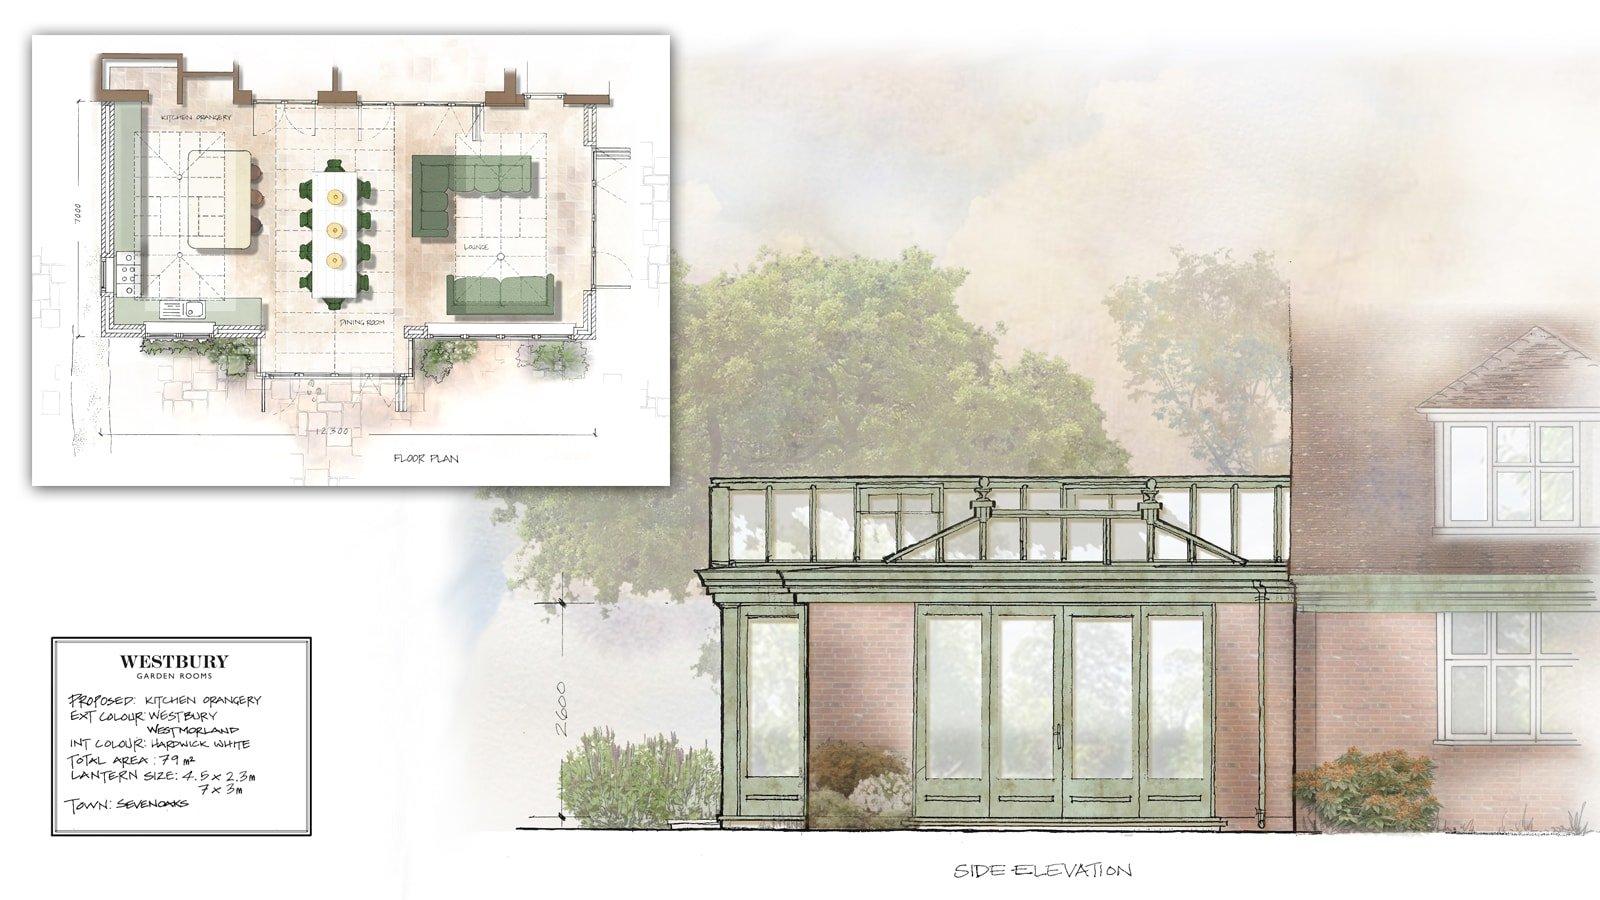 Design Drawing Sevenoaks